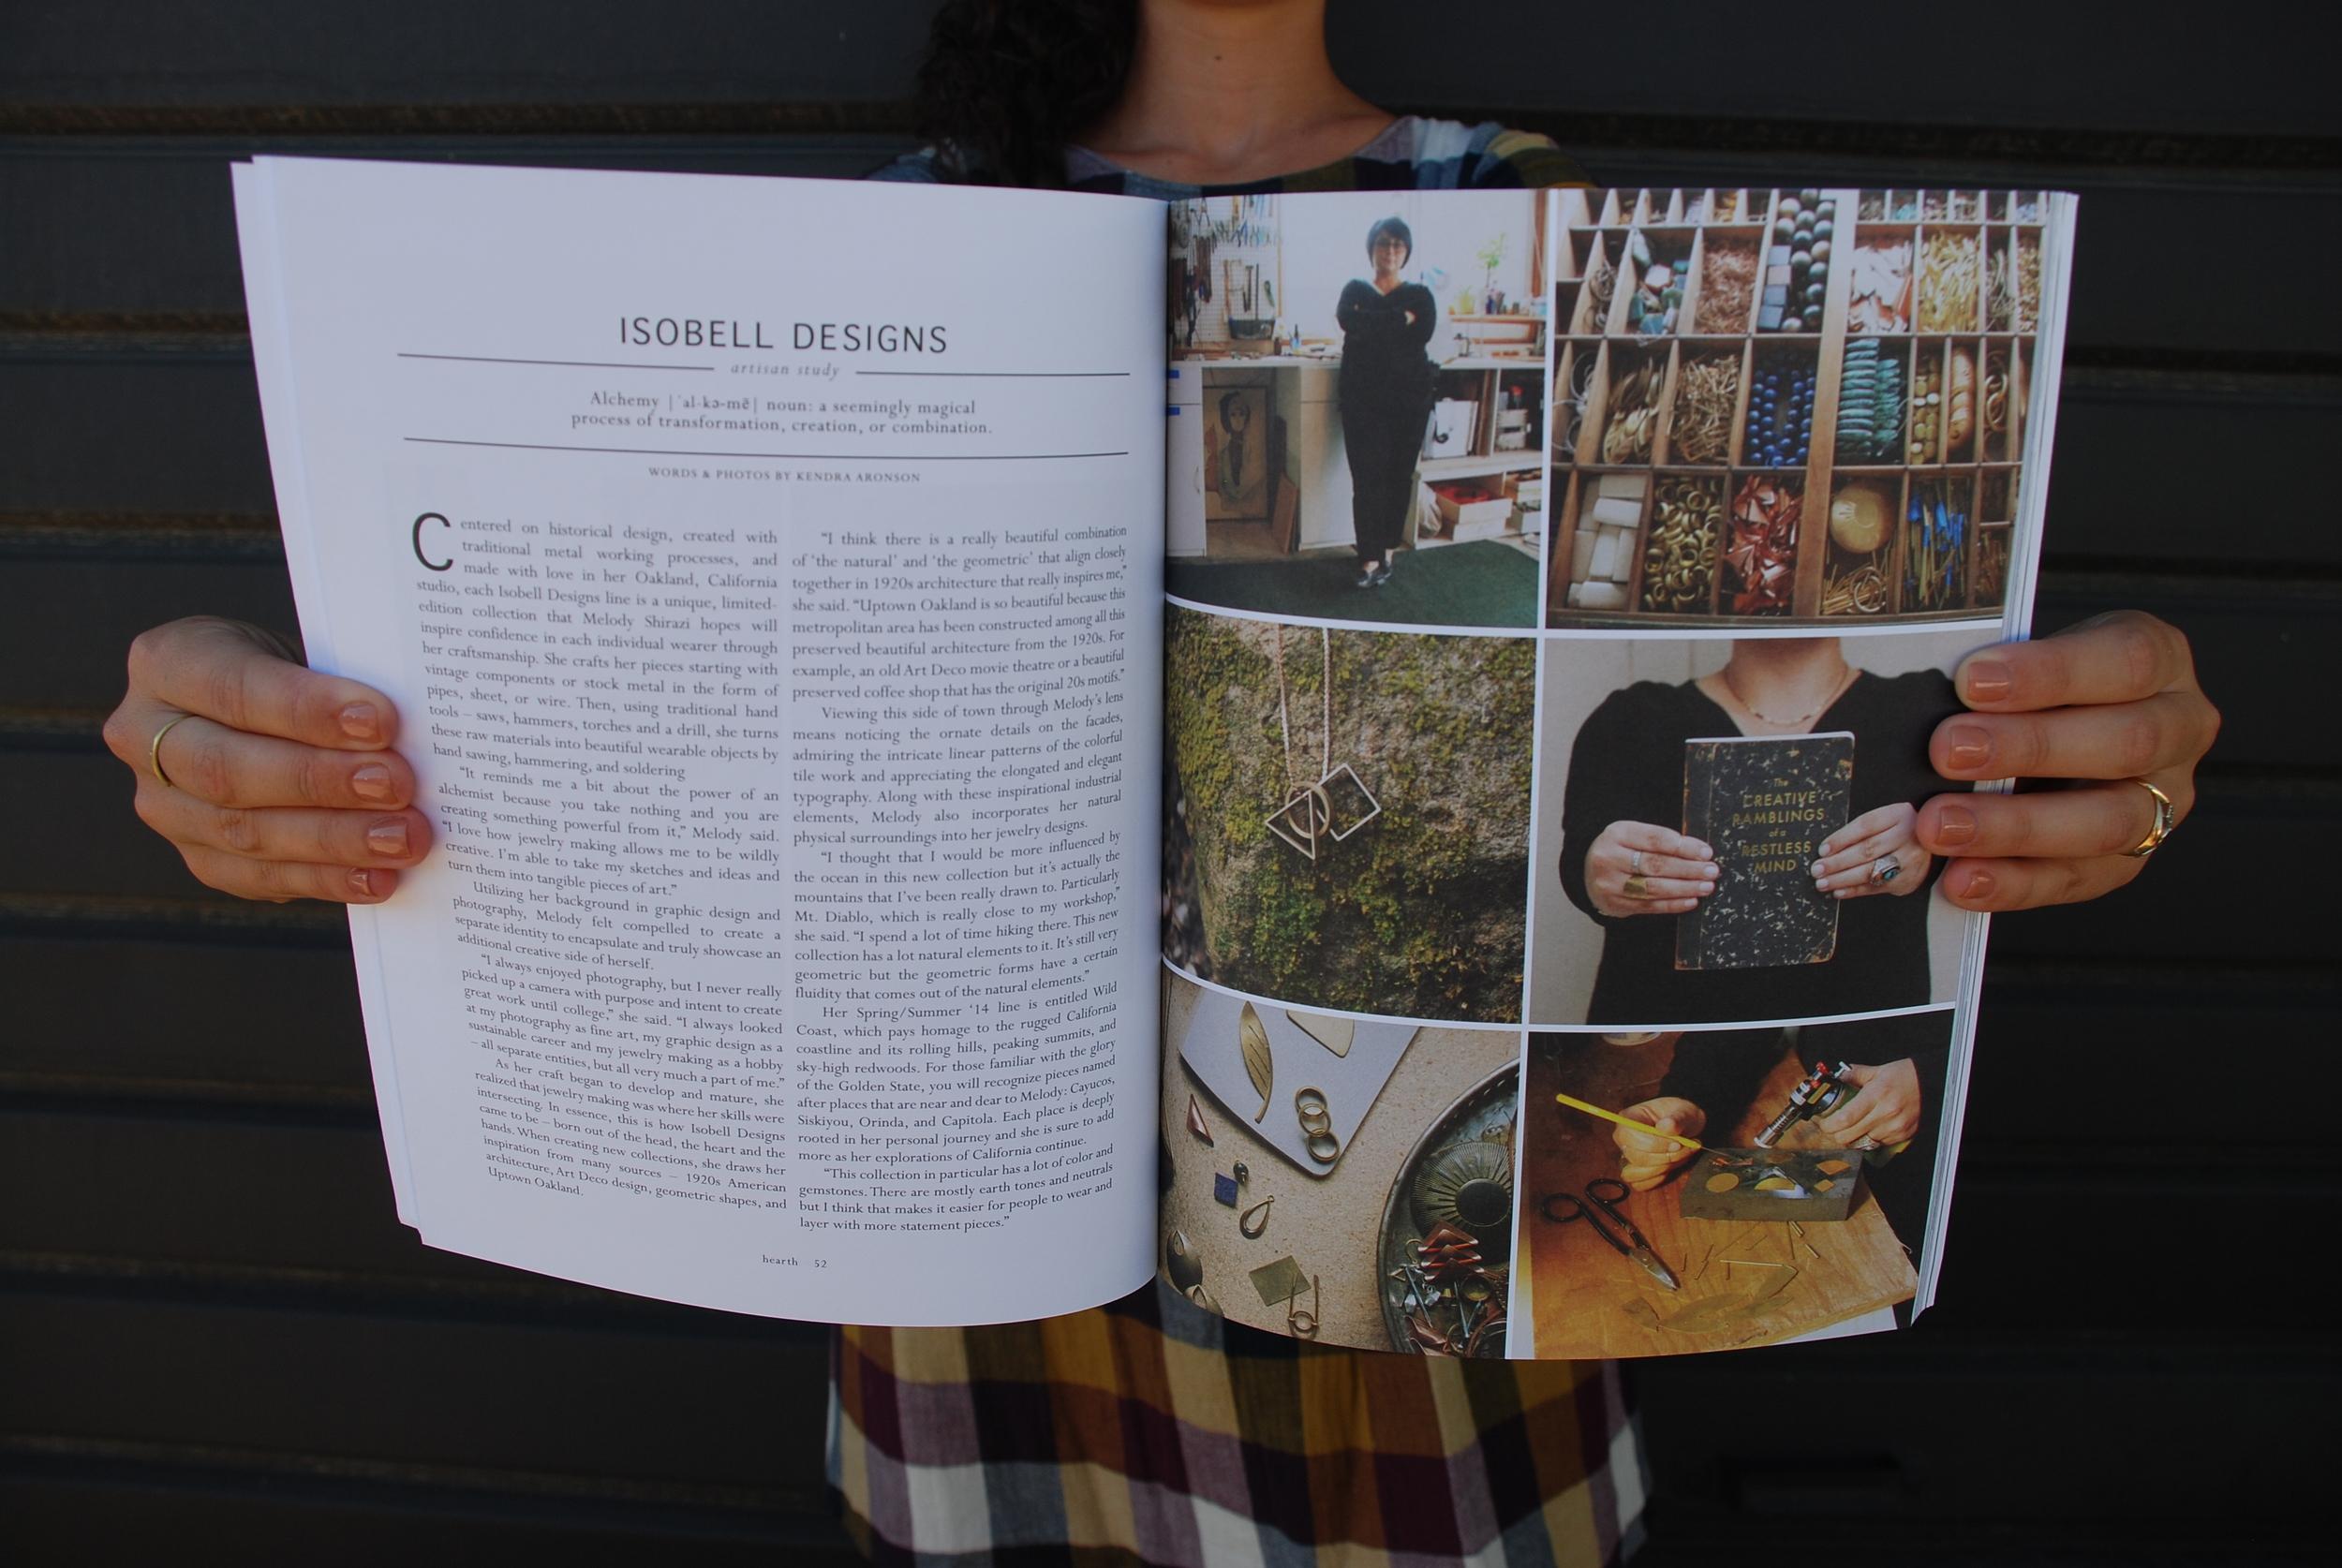 kendra-aronson-hearth-magazine-isobell-designs.JPG